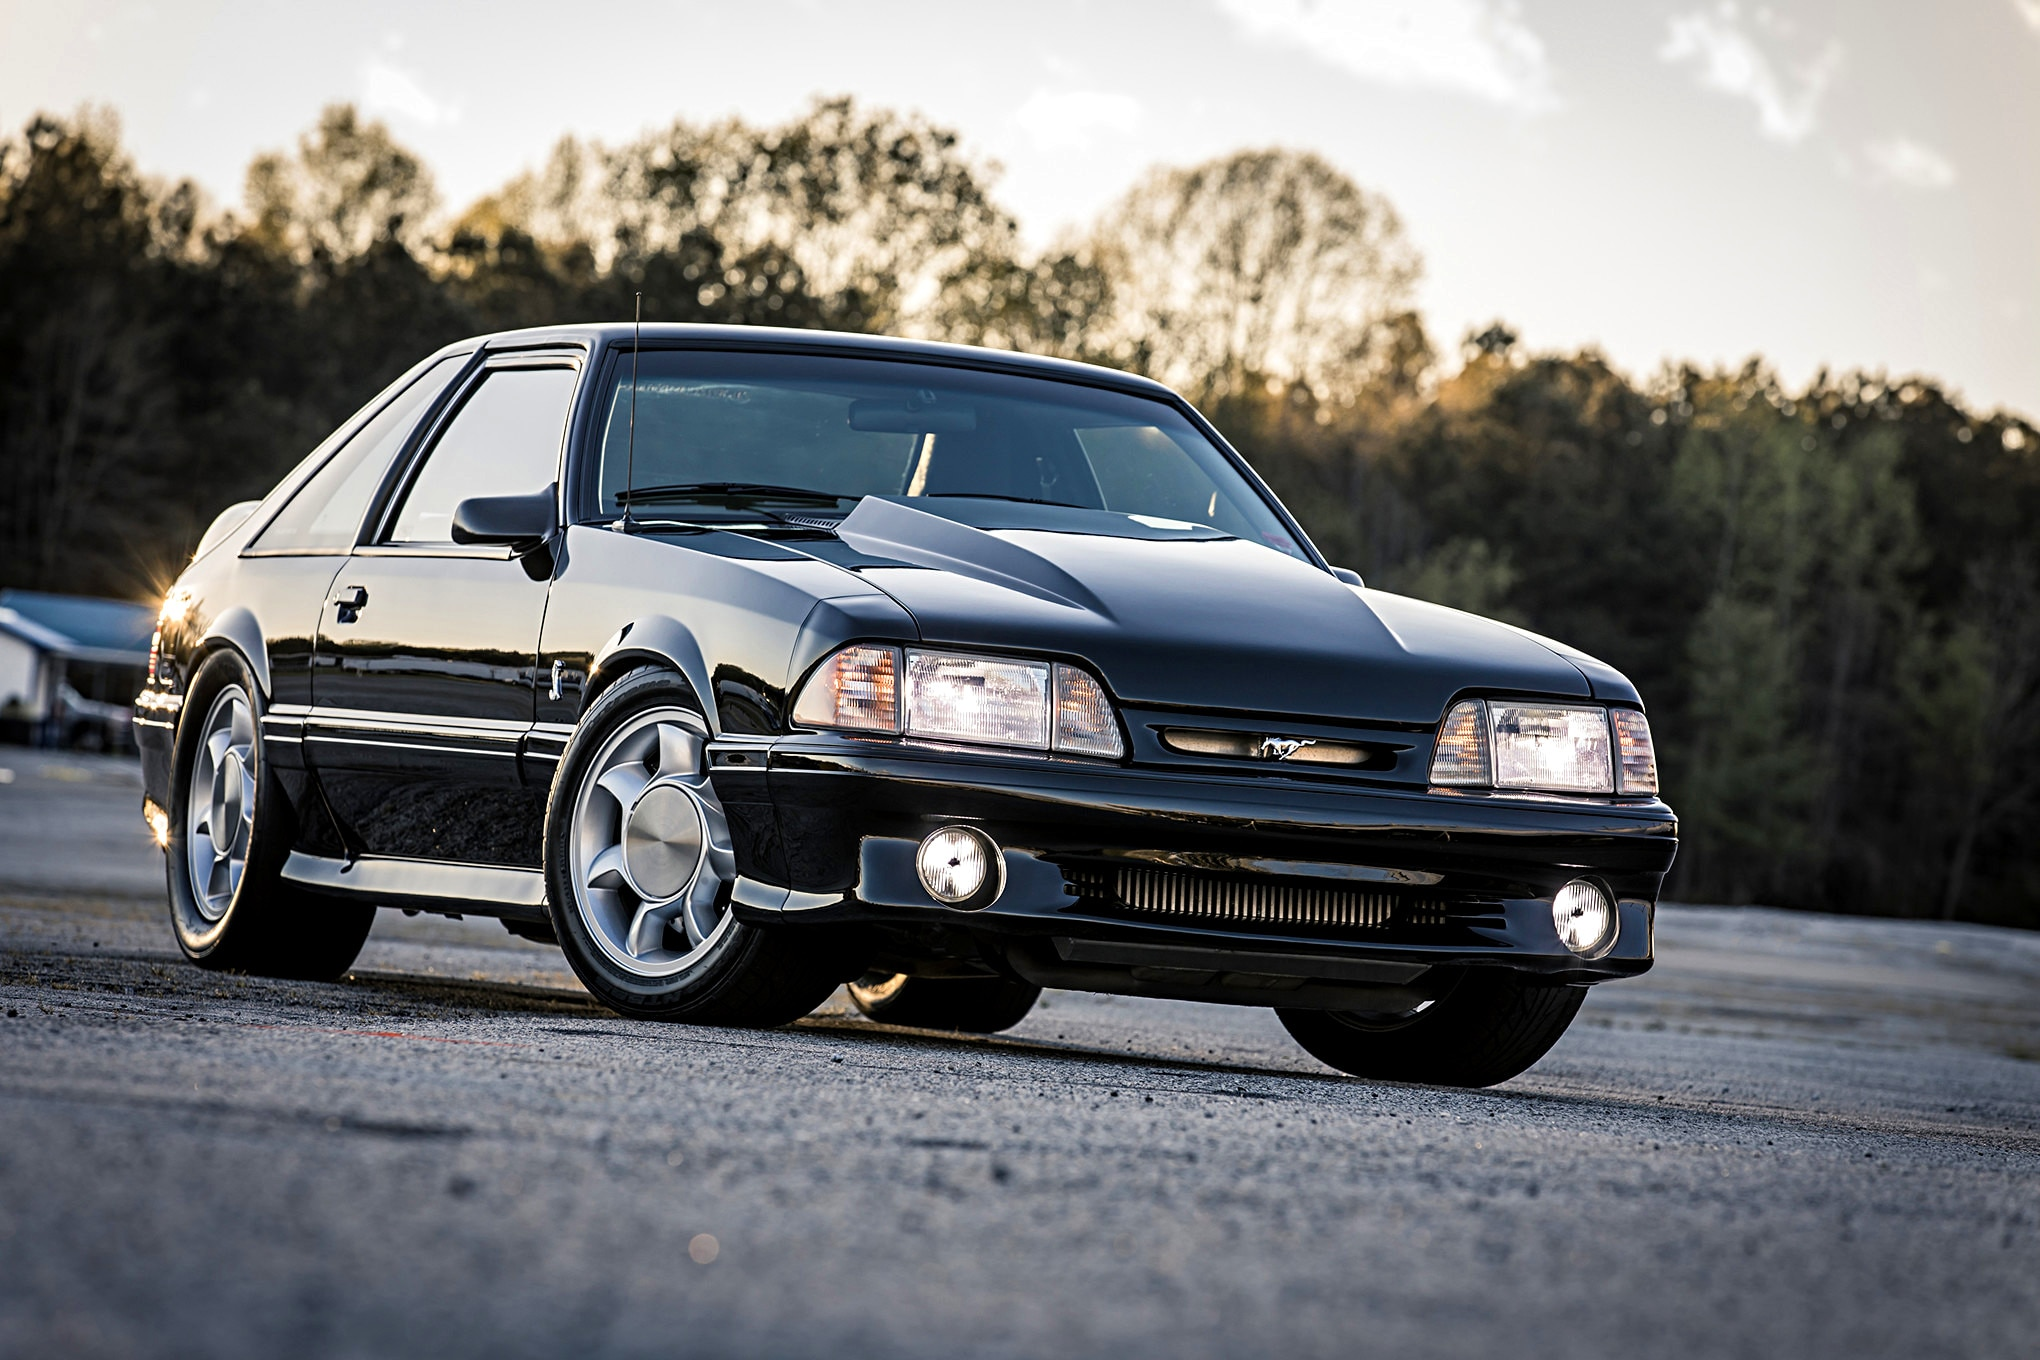 Brad Brand Fox Cobra Mustang Turbo 001